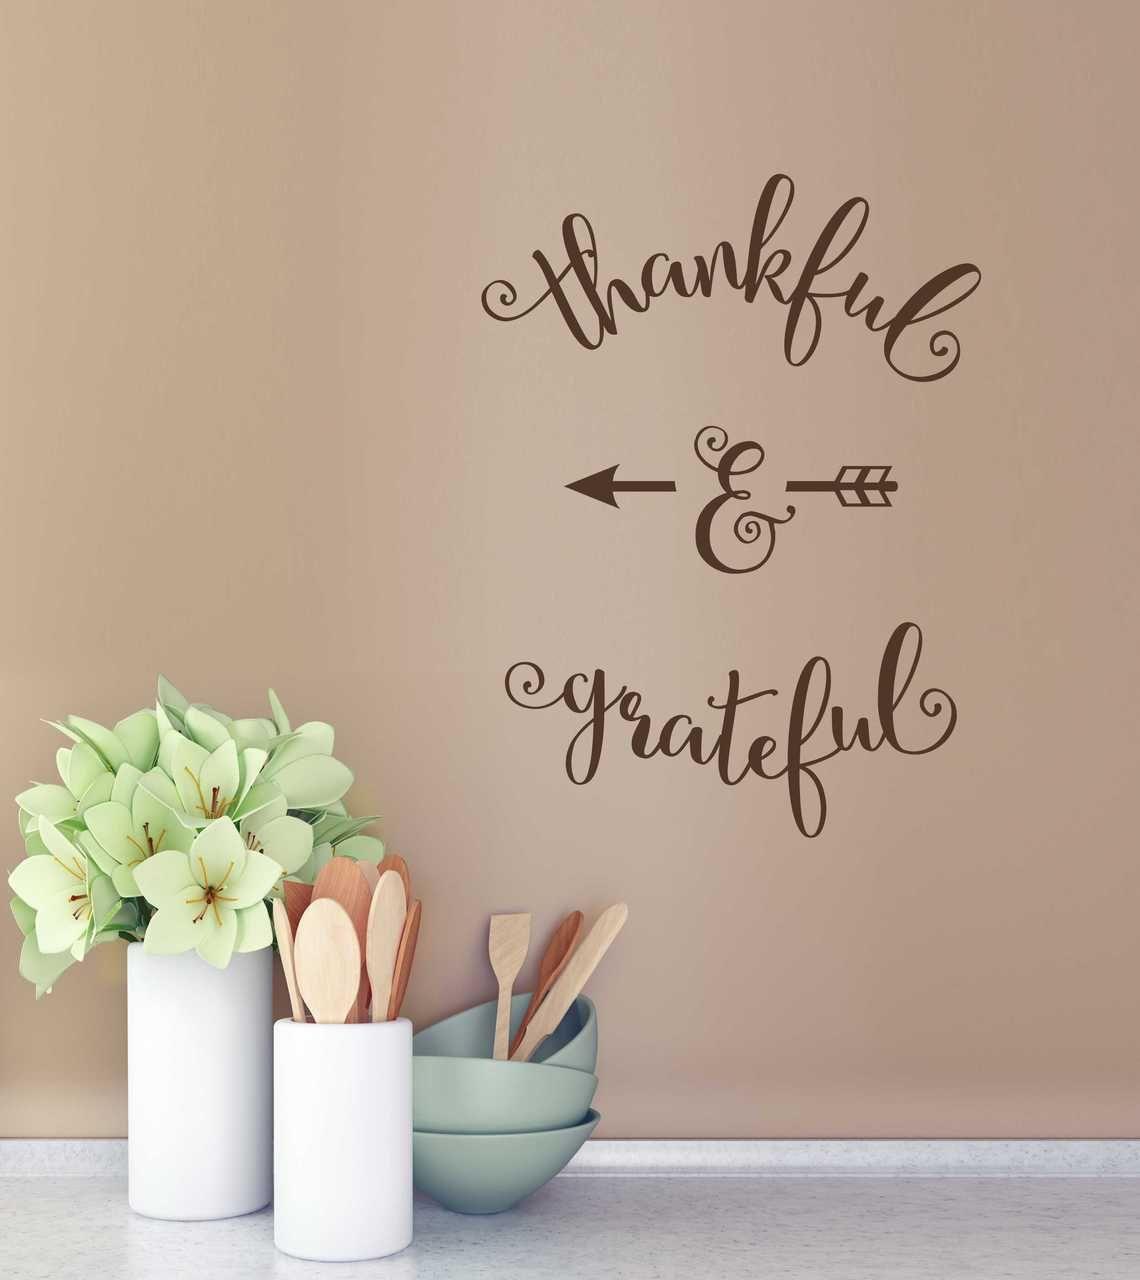 Thankful Grateful Elegant Vinyl Wall Decals Fall Or Kitchen